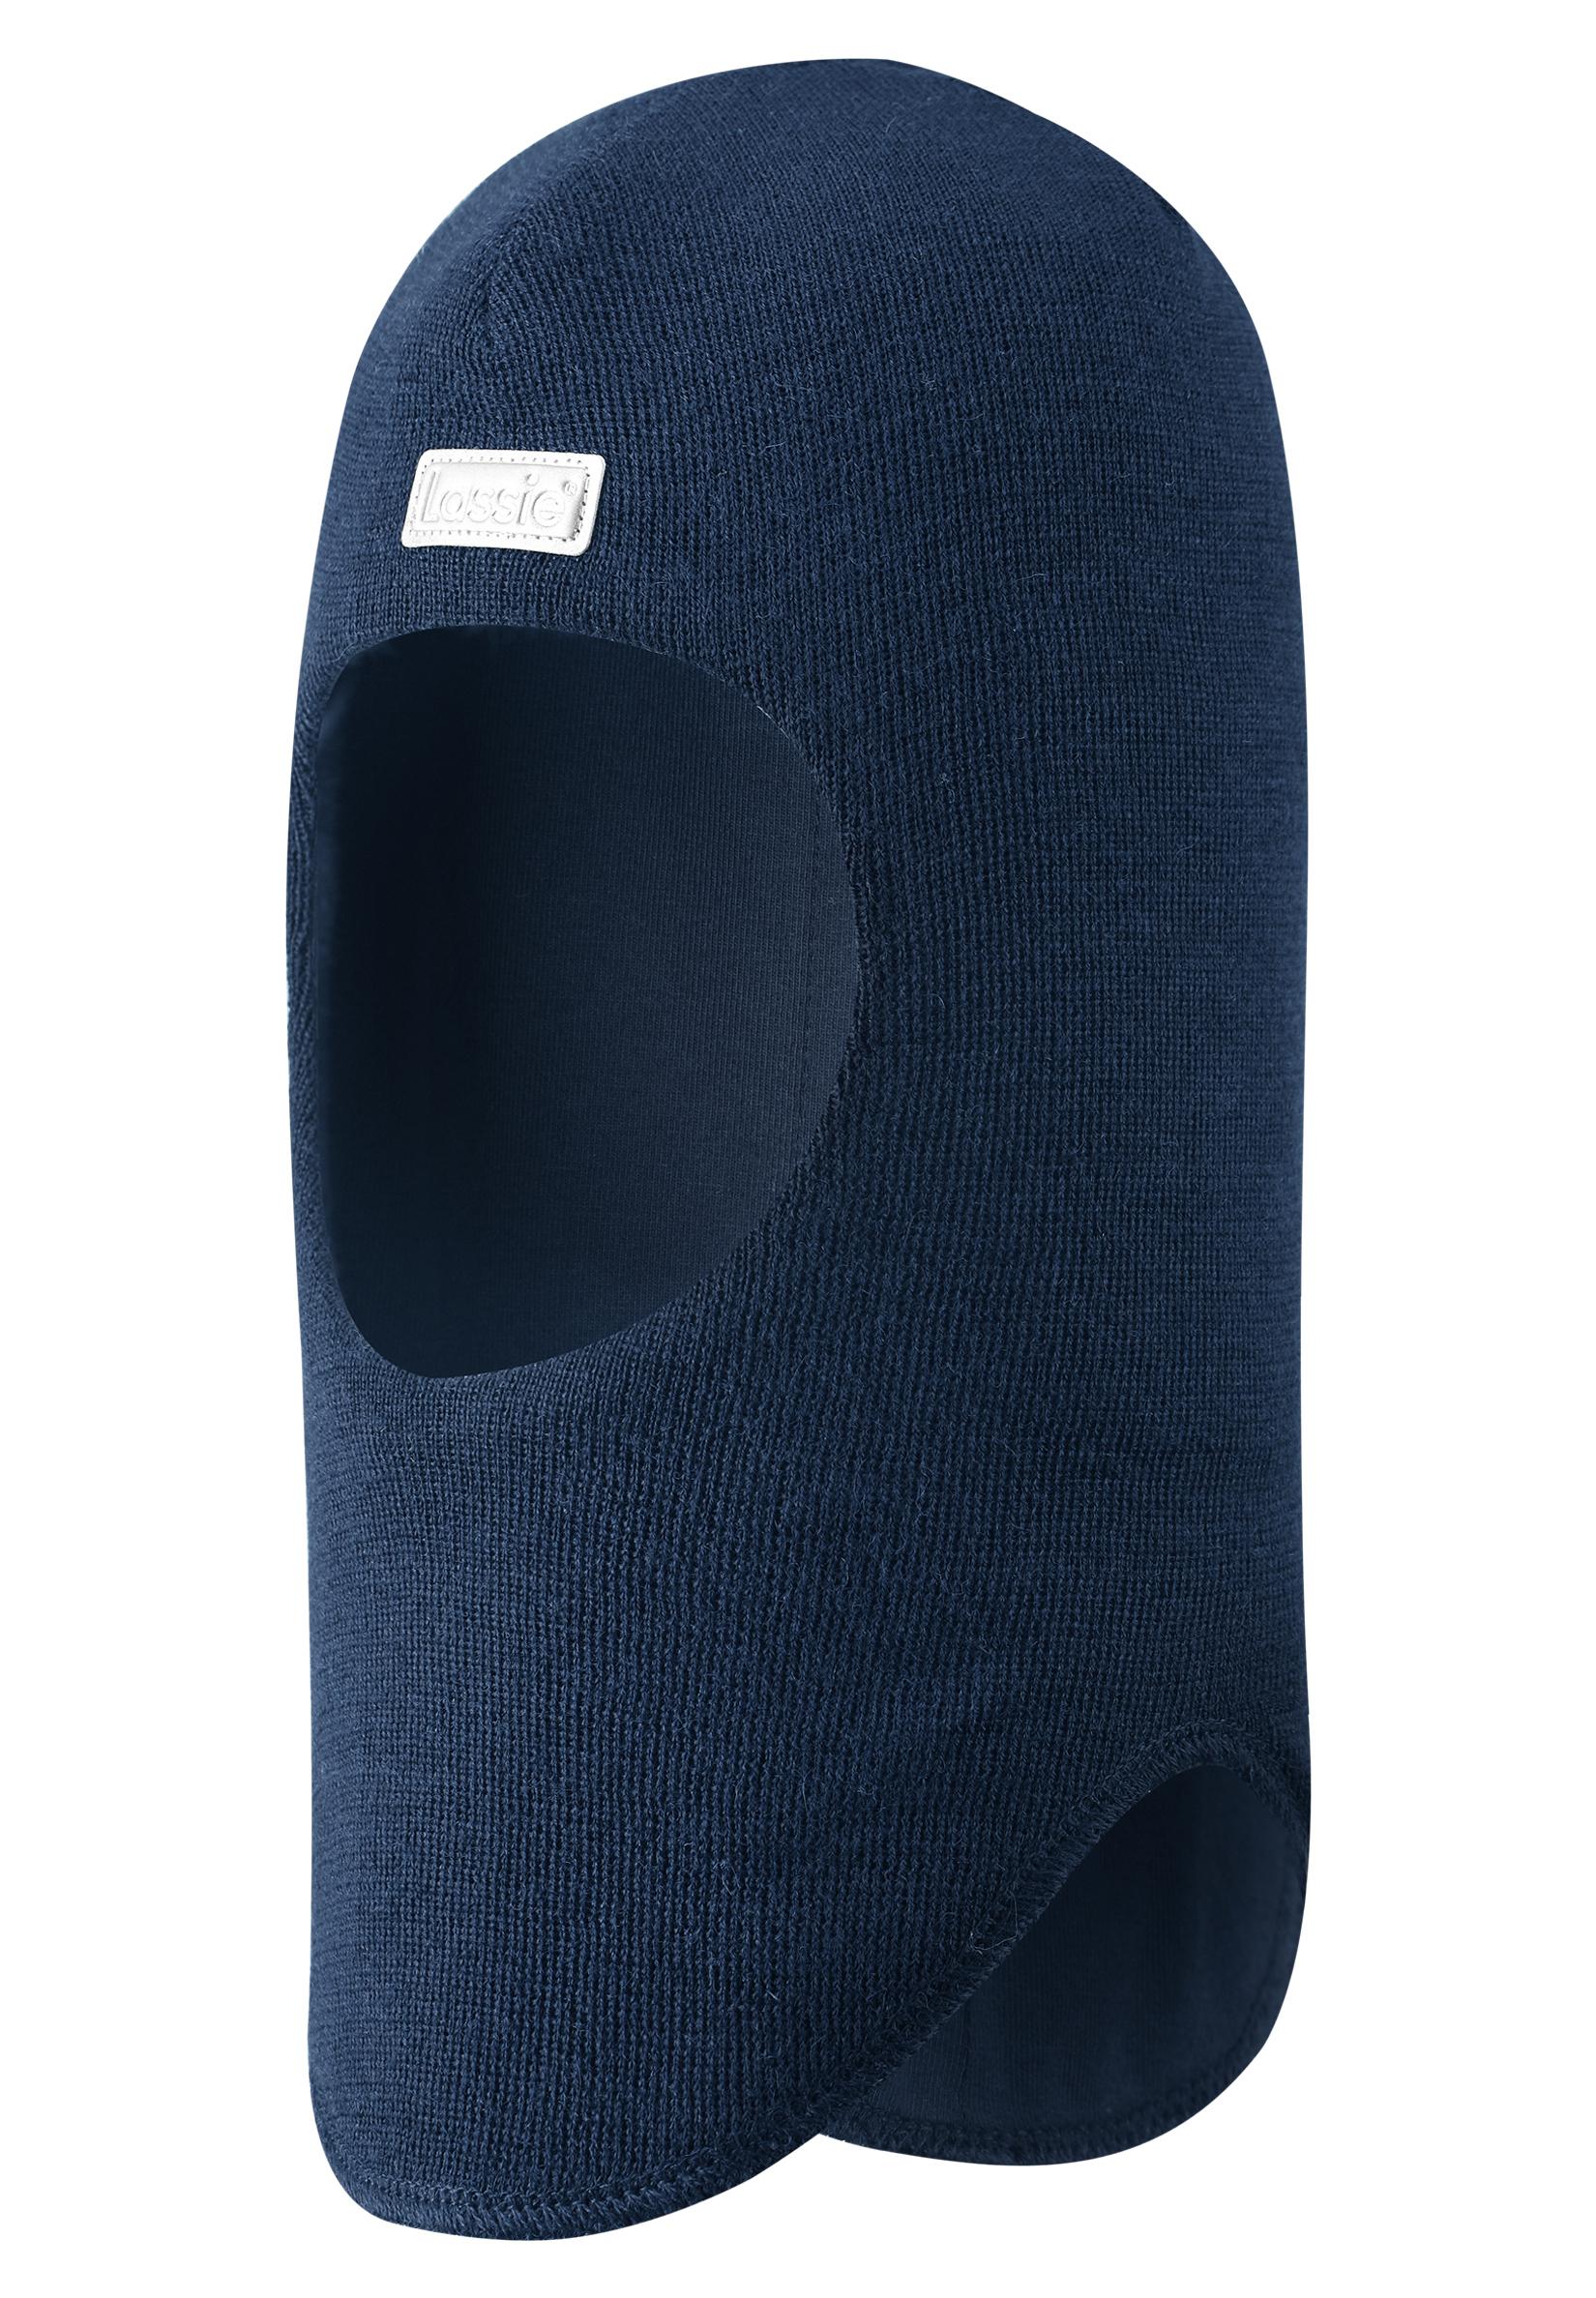 Головные уборы Lassie Шапка-шлем Lassie, синяя skiki skiki шапка шлем зимняя синяя